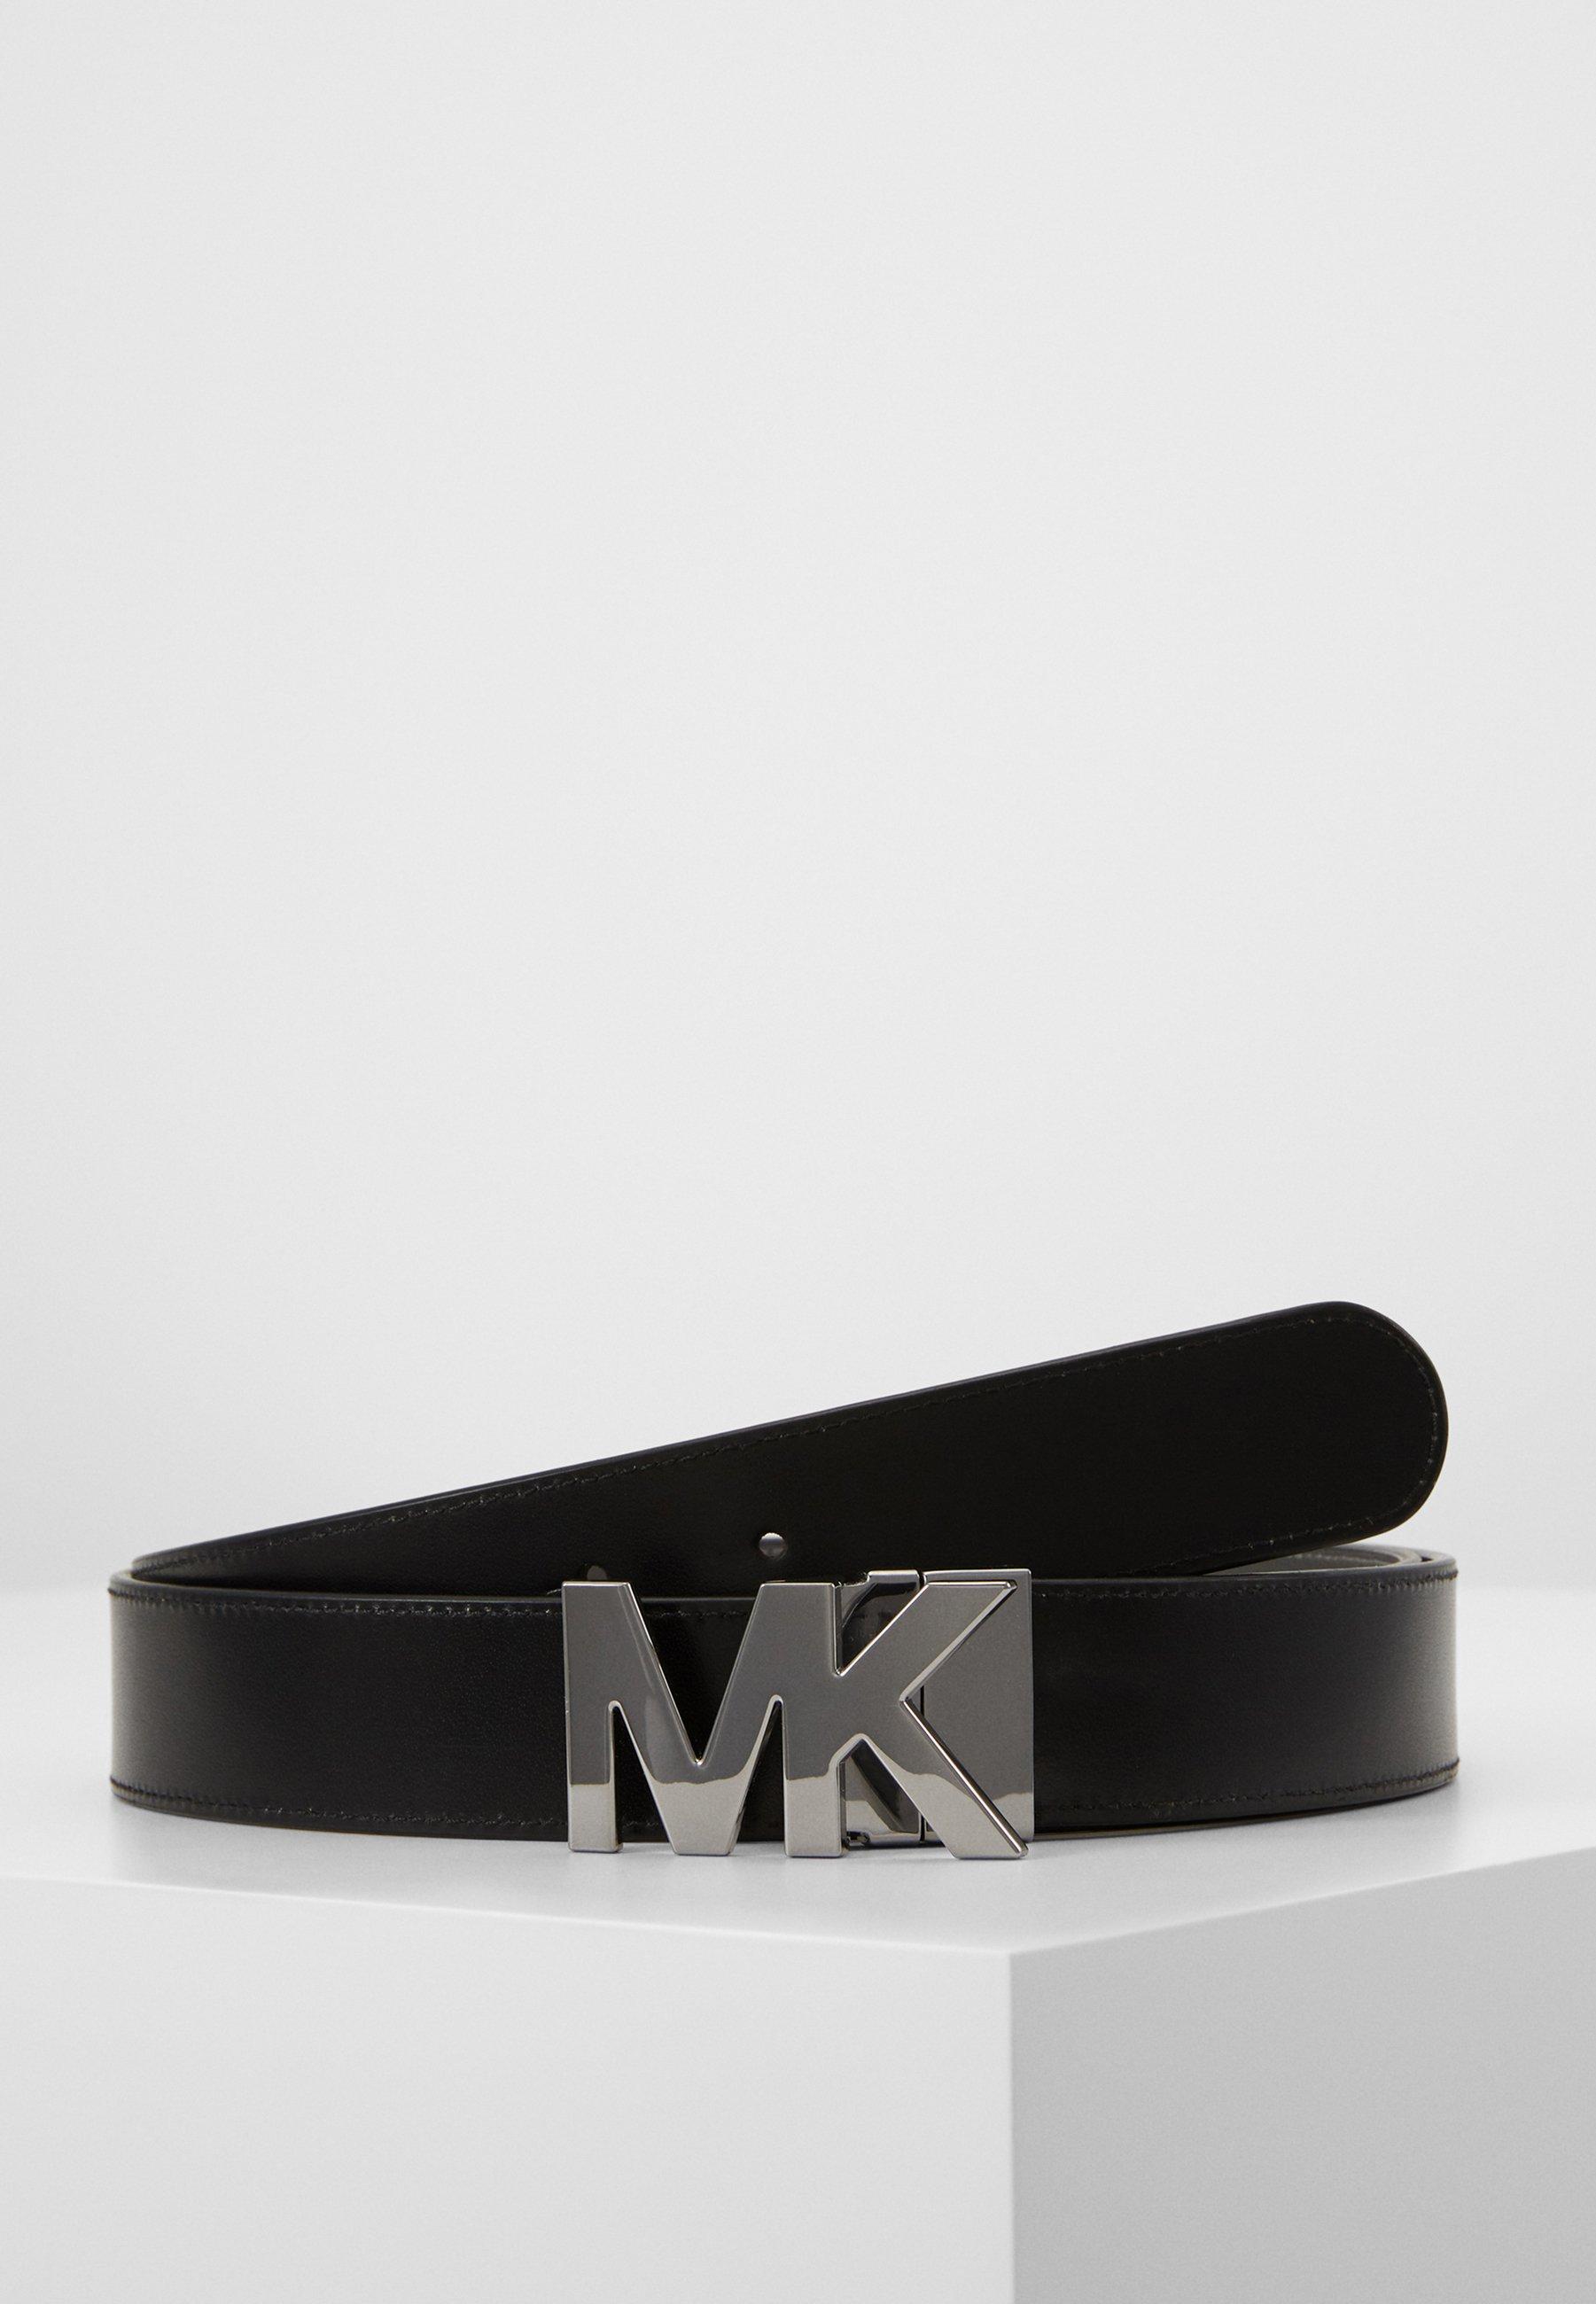 Michael Kors BUCKLE BELT - Ceinture - black/noir - ZALANDO.FR